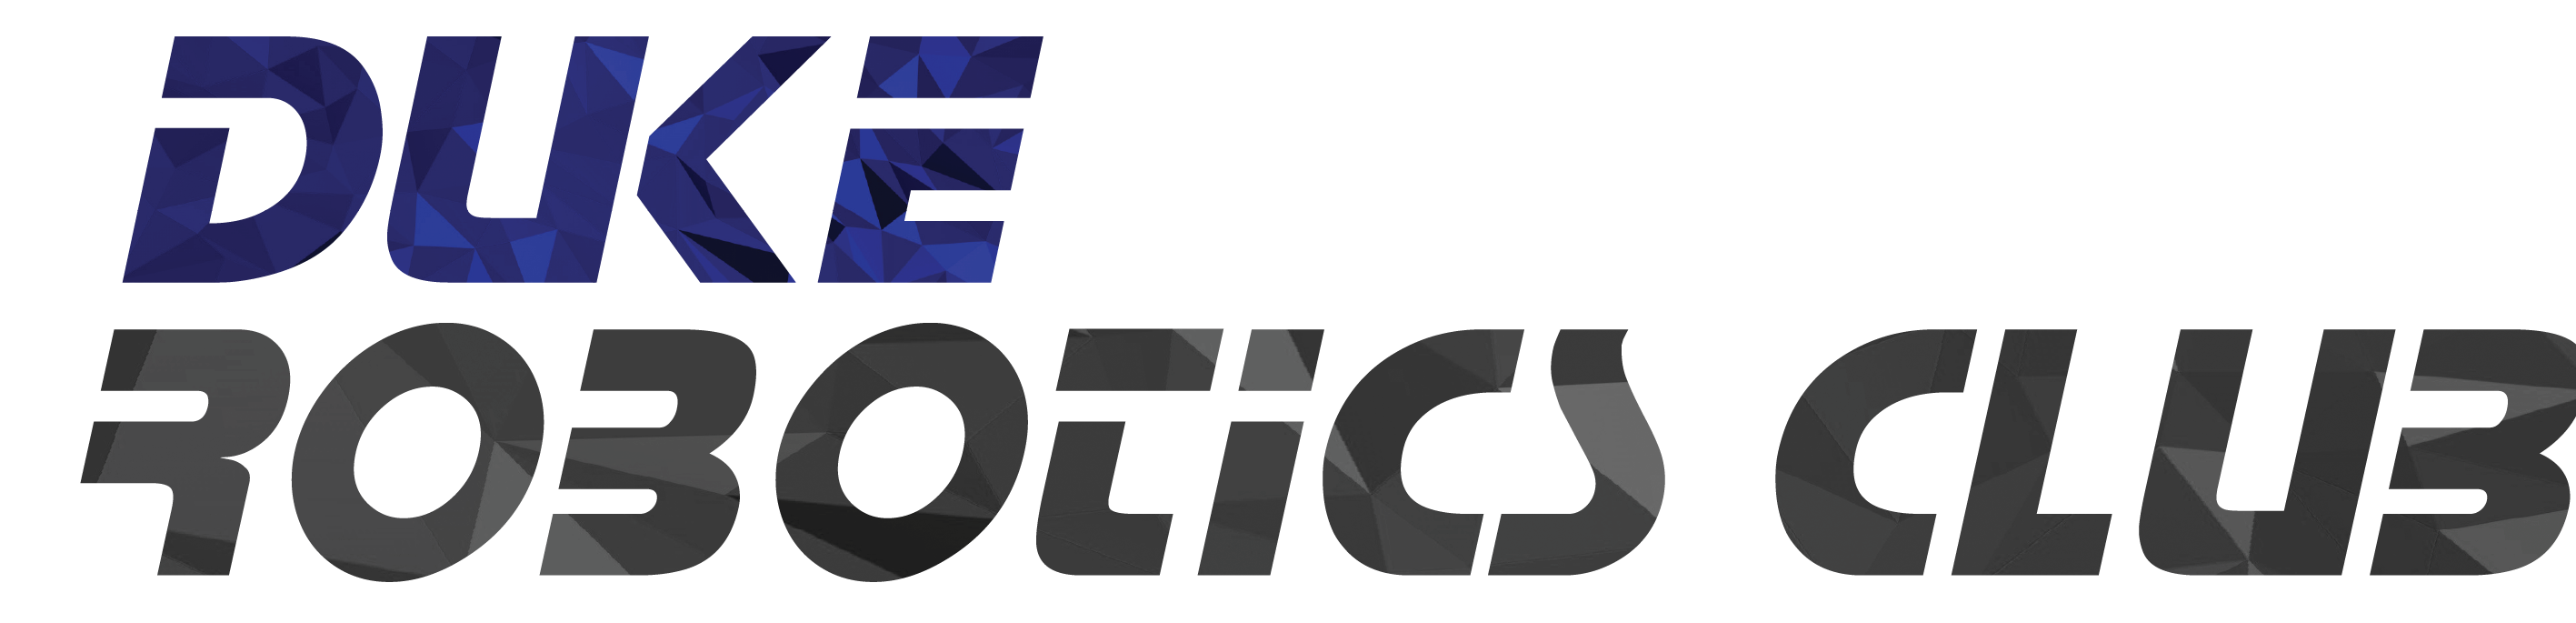 Duke Robotics Club